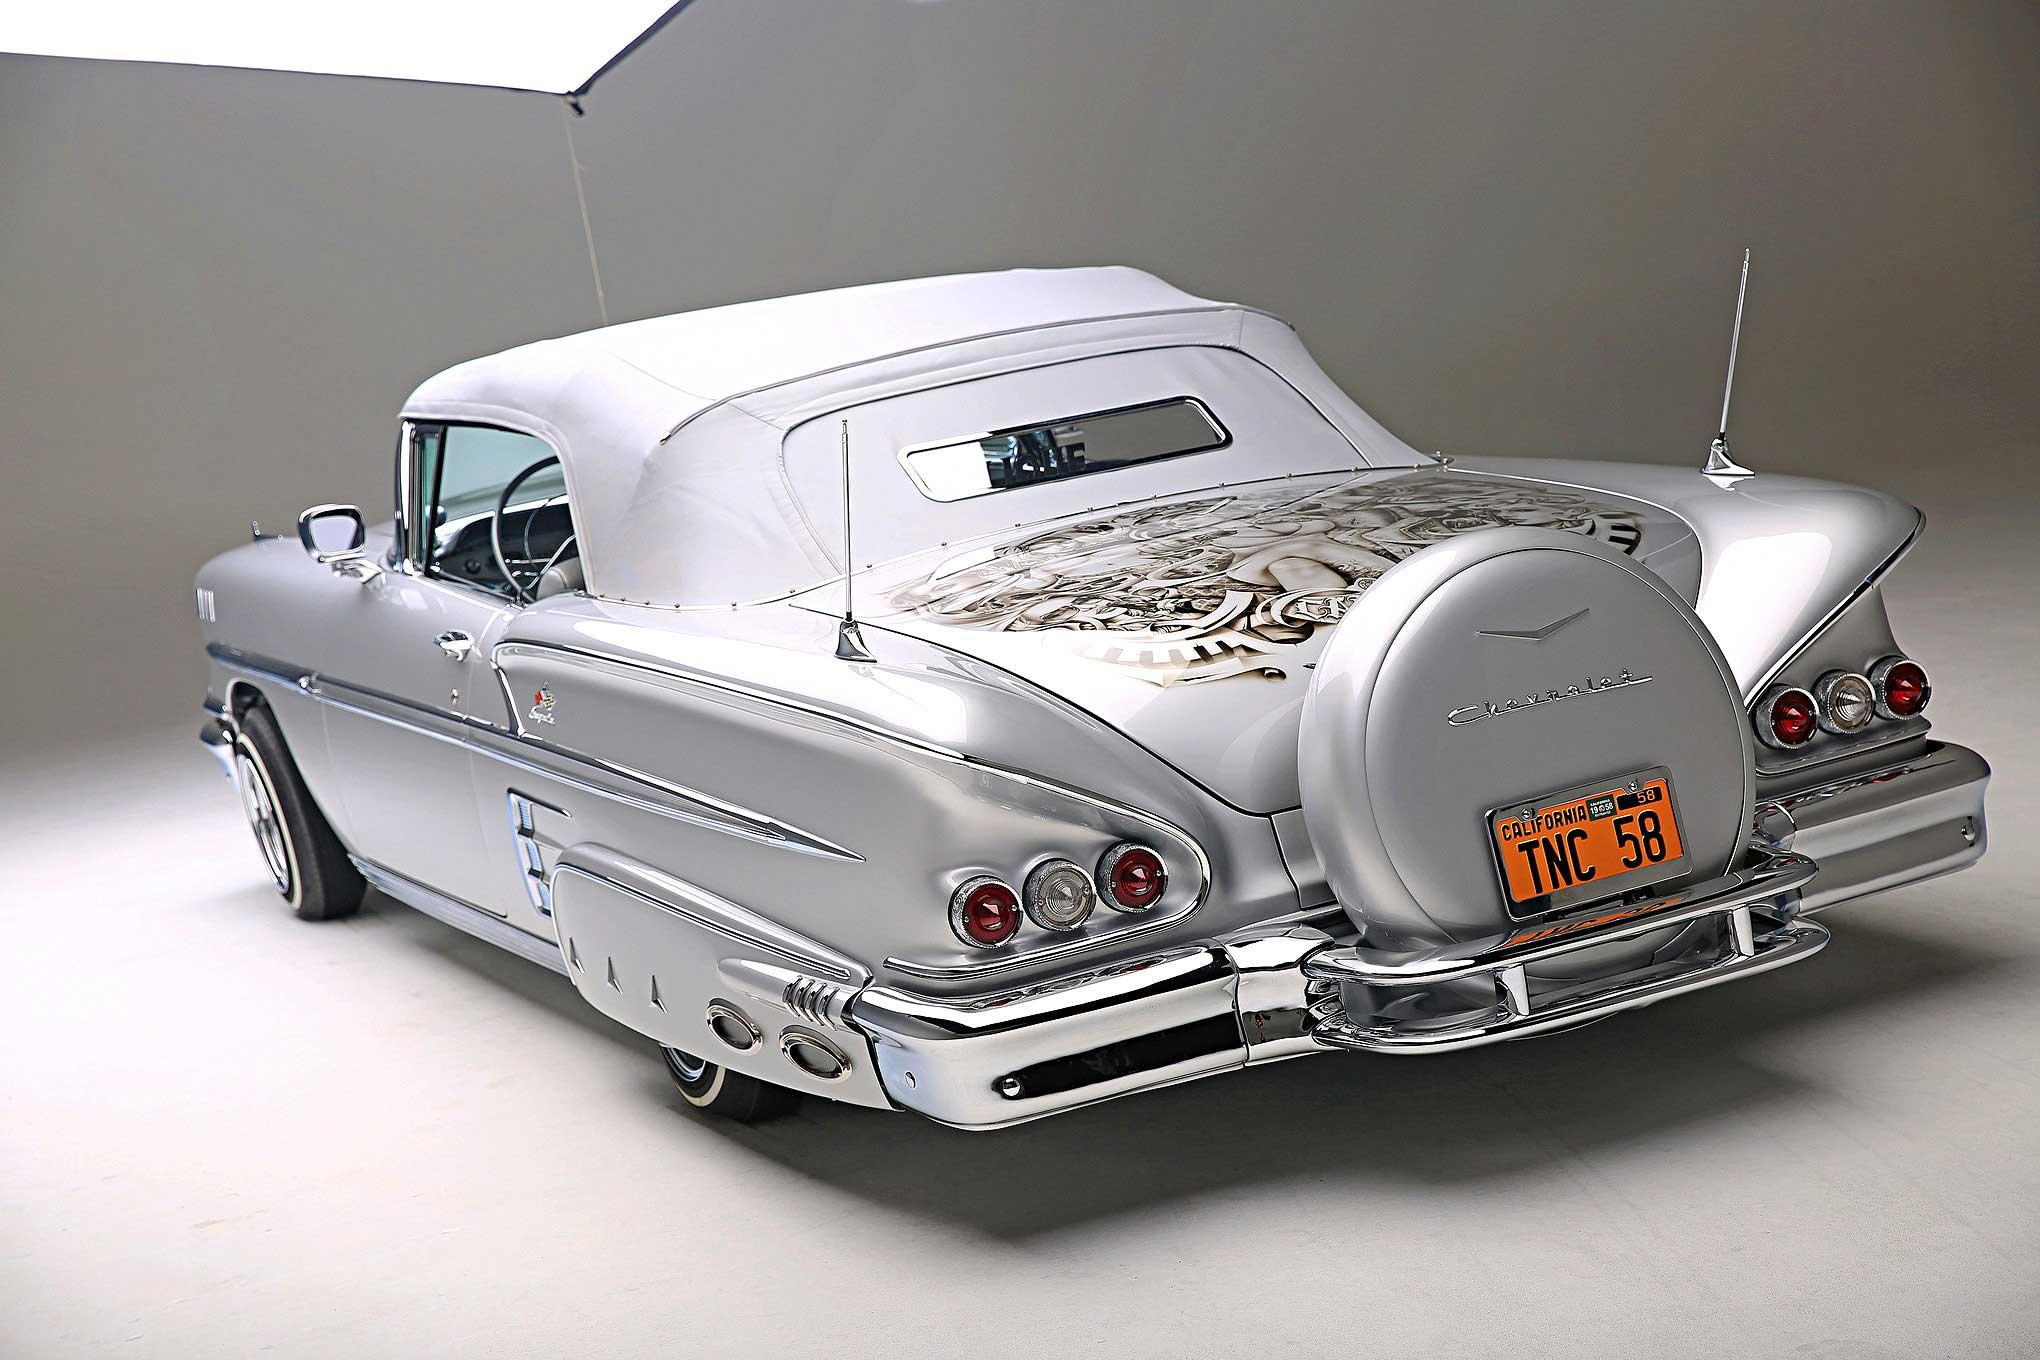 Chevy Impala White Paint